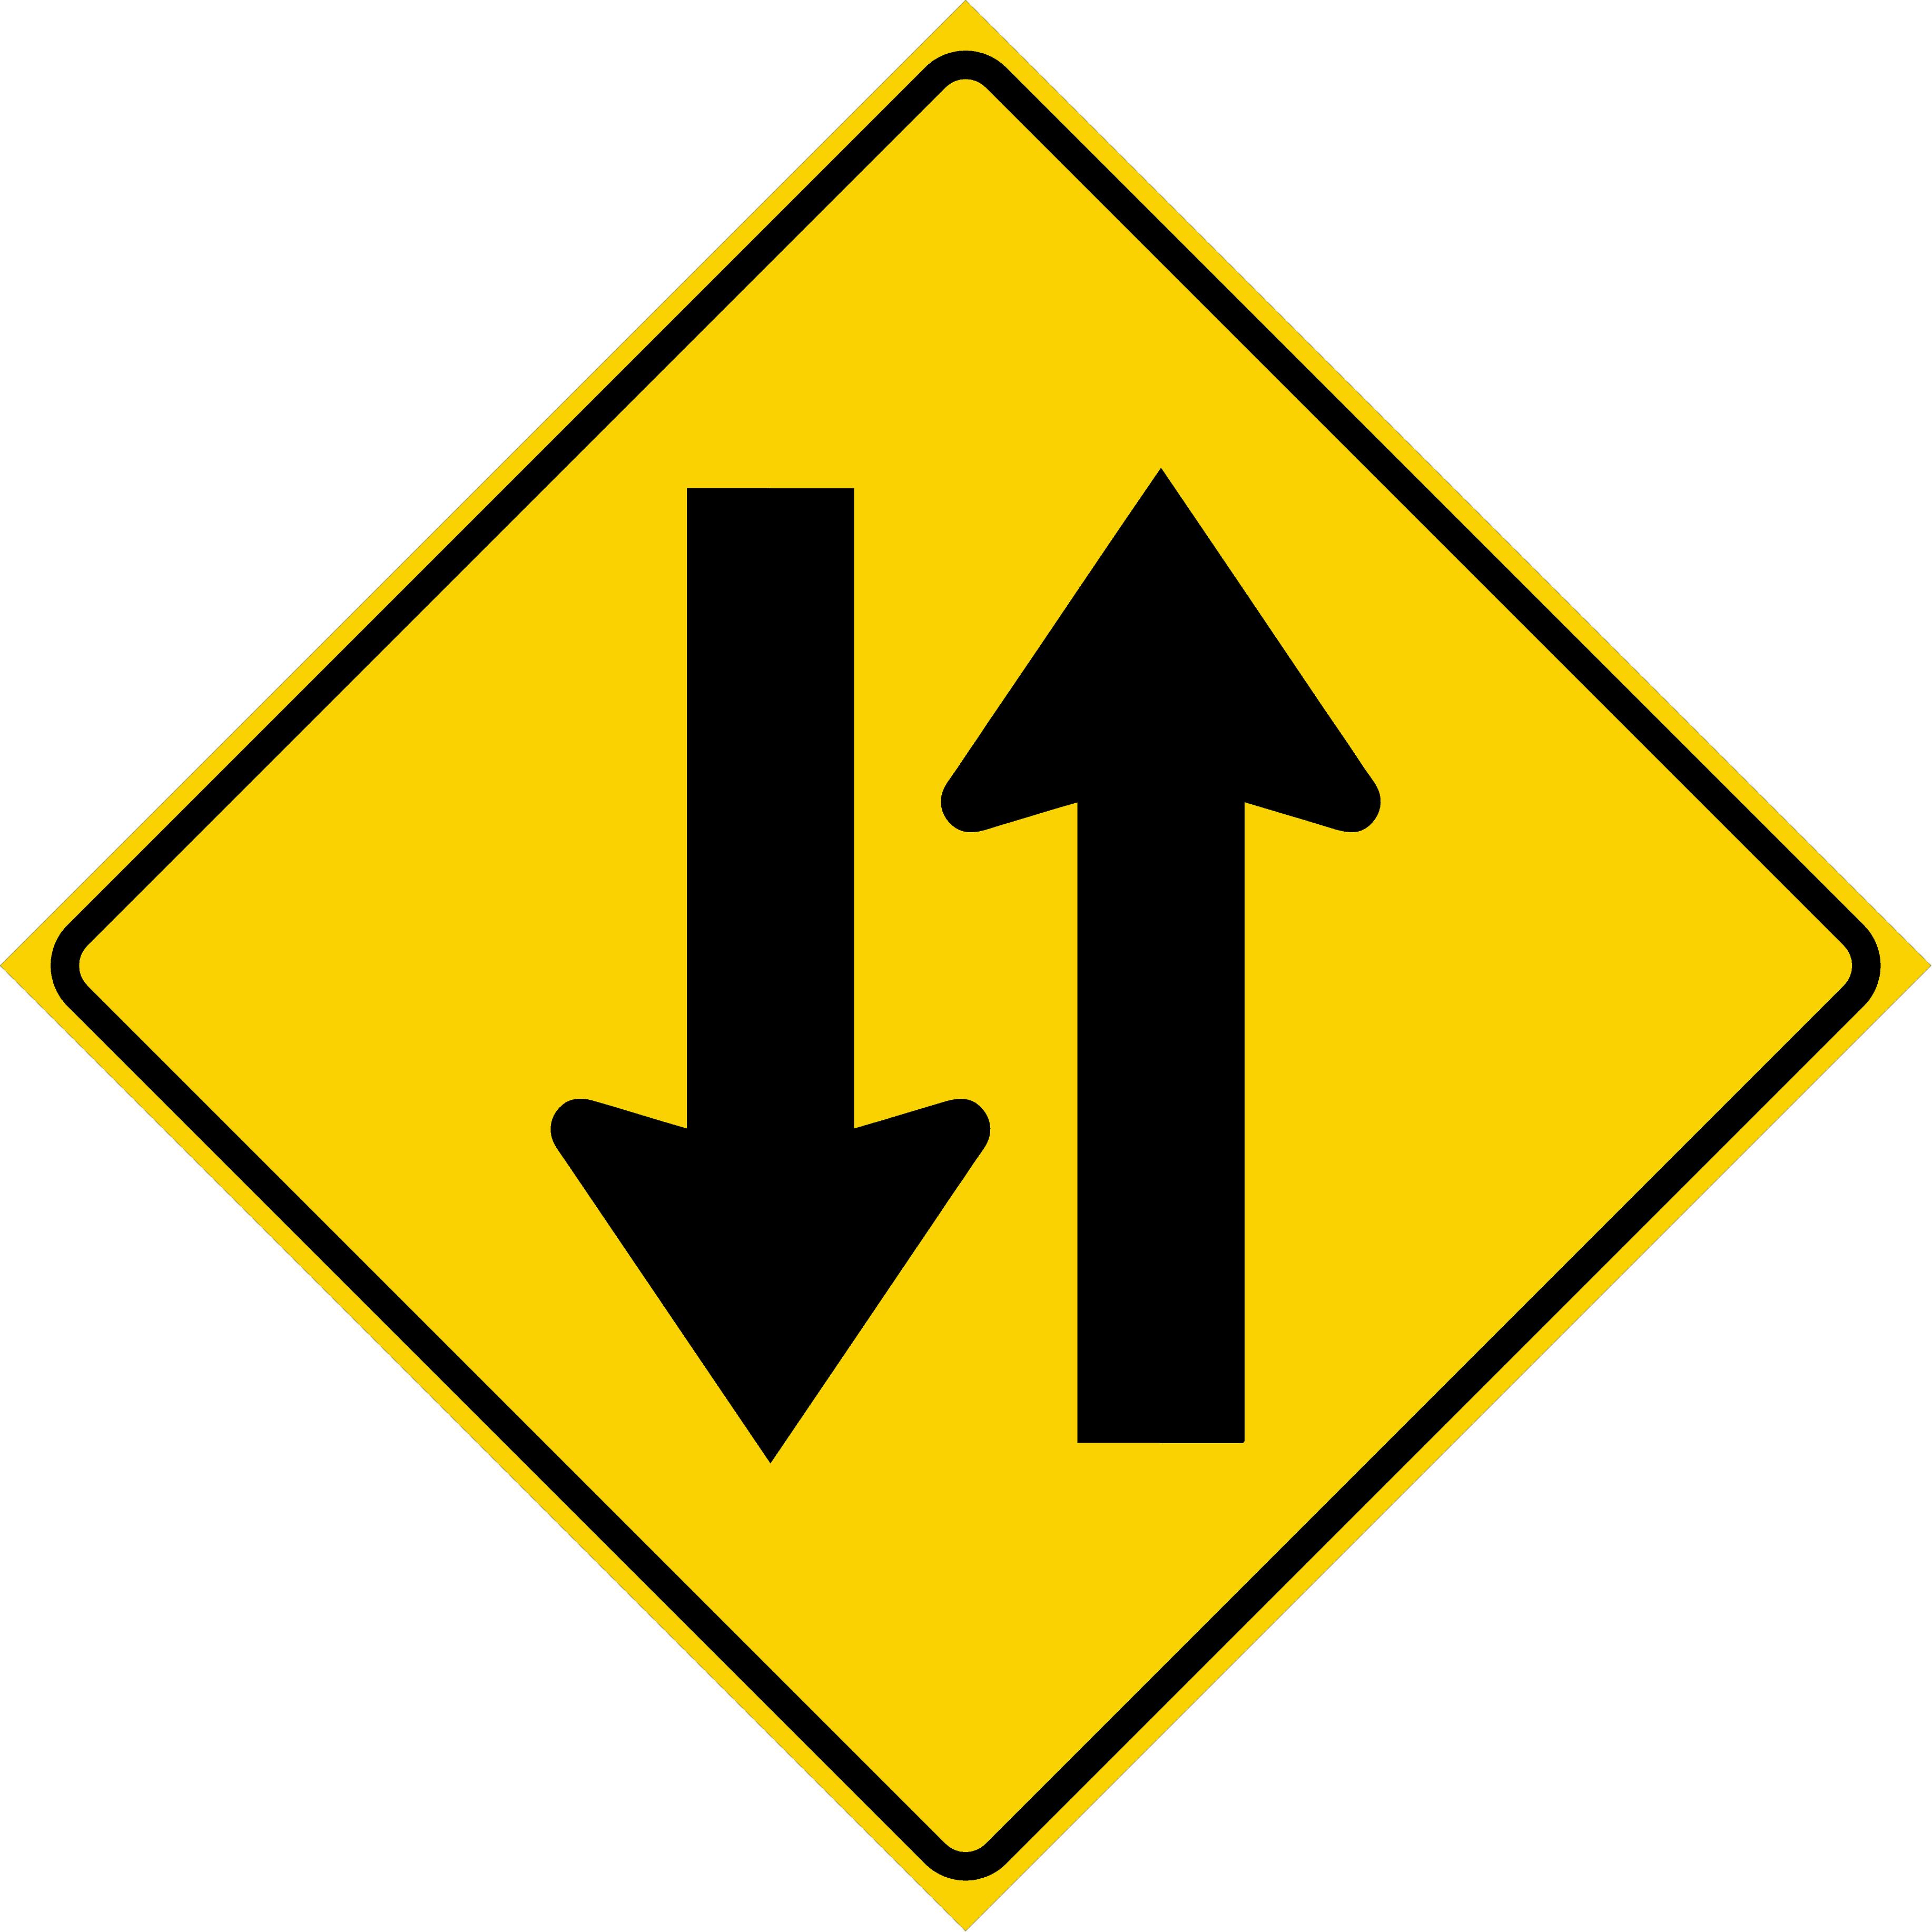 Two Way Traffic Symbol (W6-3)